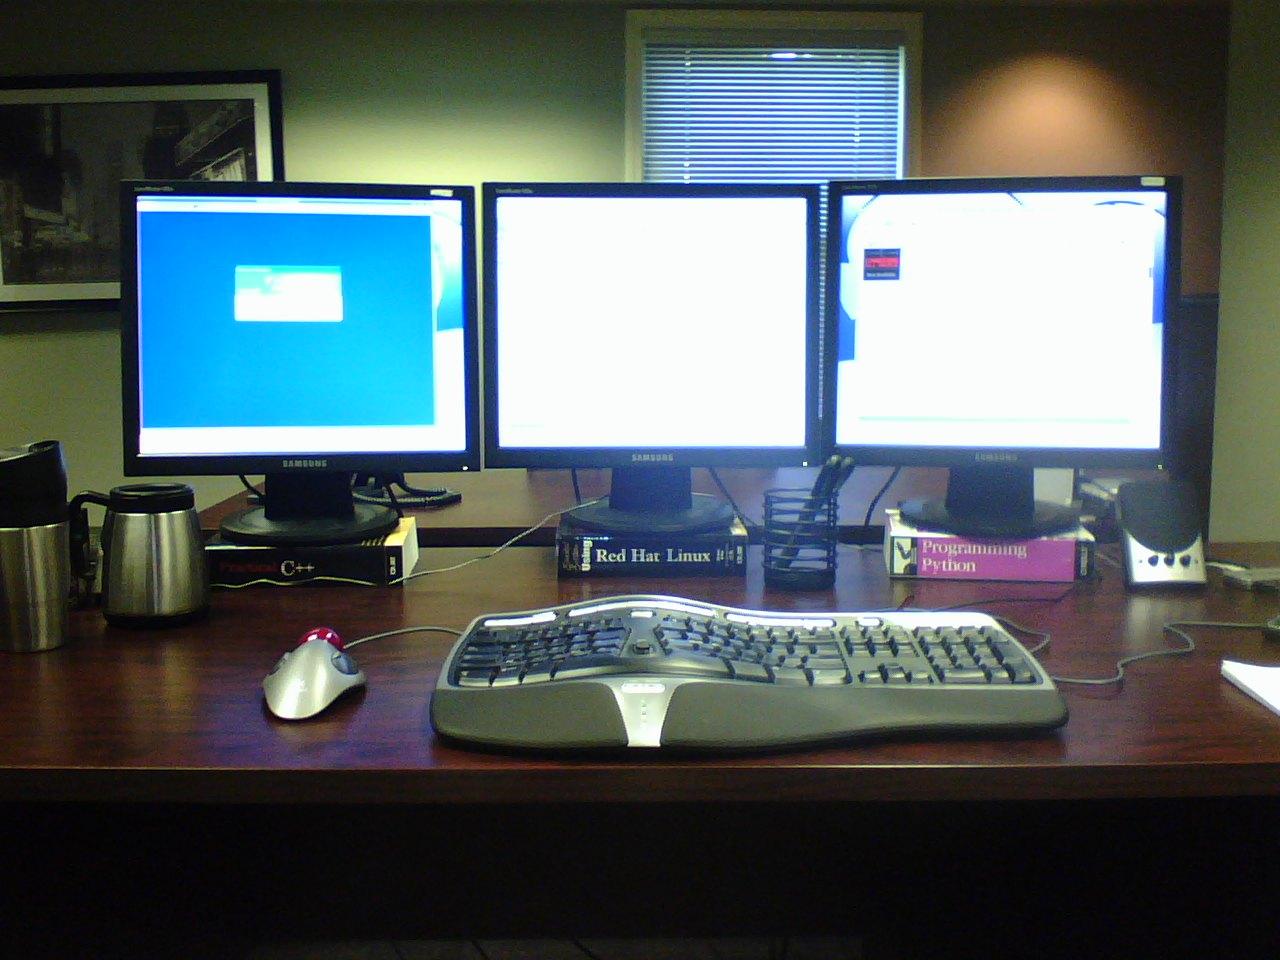 Multi Monitor Goodness Linlog